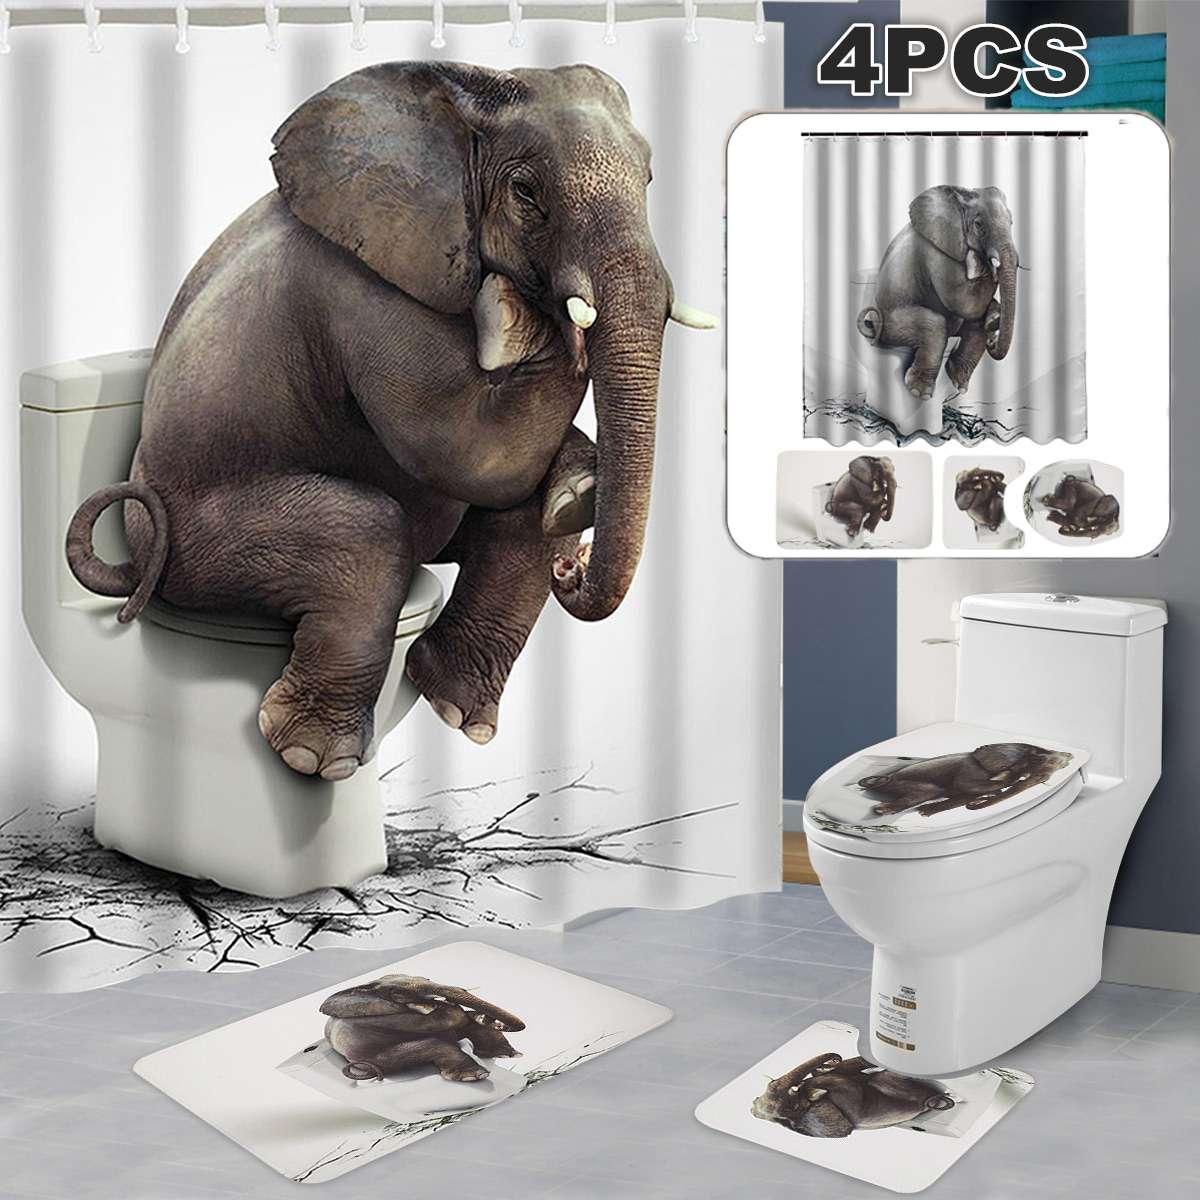 Honana Bathroom 4 Pieces/set Rug Mats Shower Curtain 1.8*1.8m Set 3d Elephant Flannel Soft Anti-slip Shower Toilet Rug Floor Mat Moderate Price Home